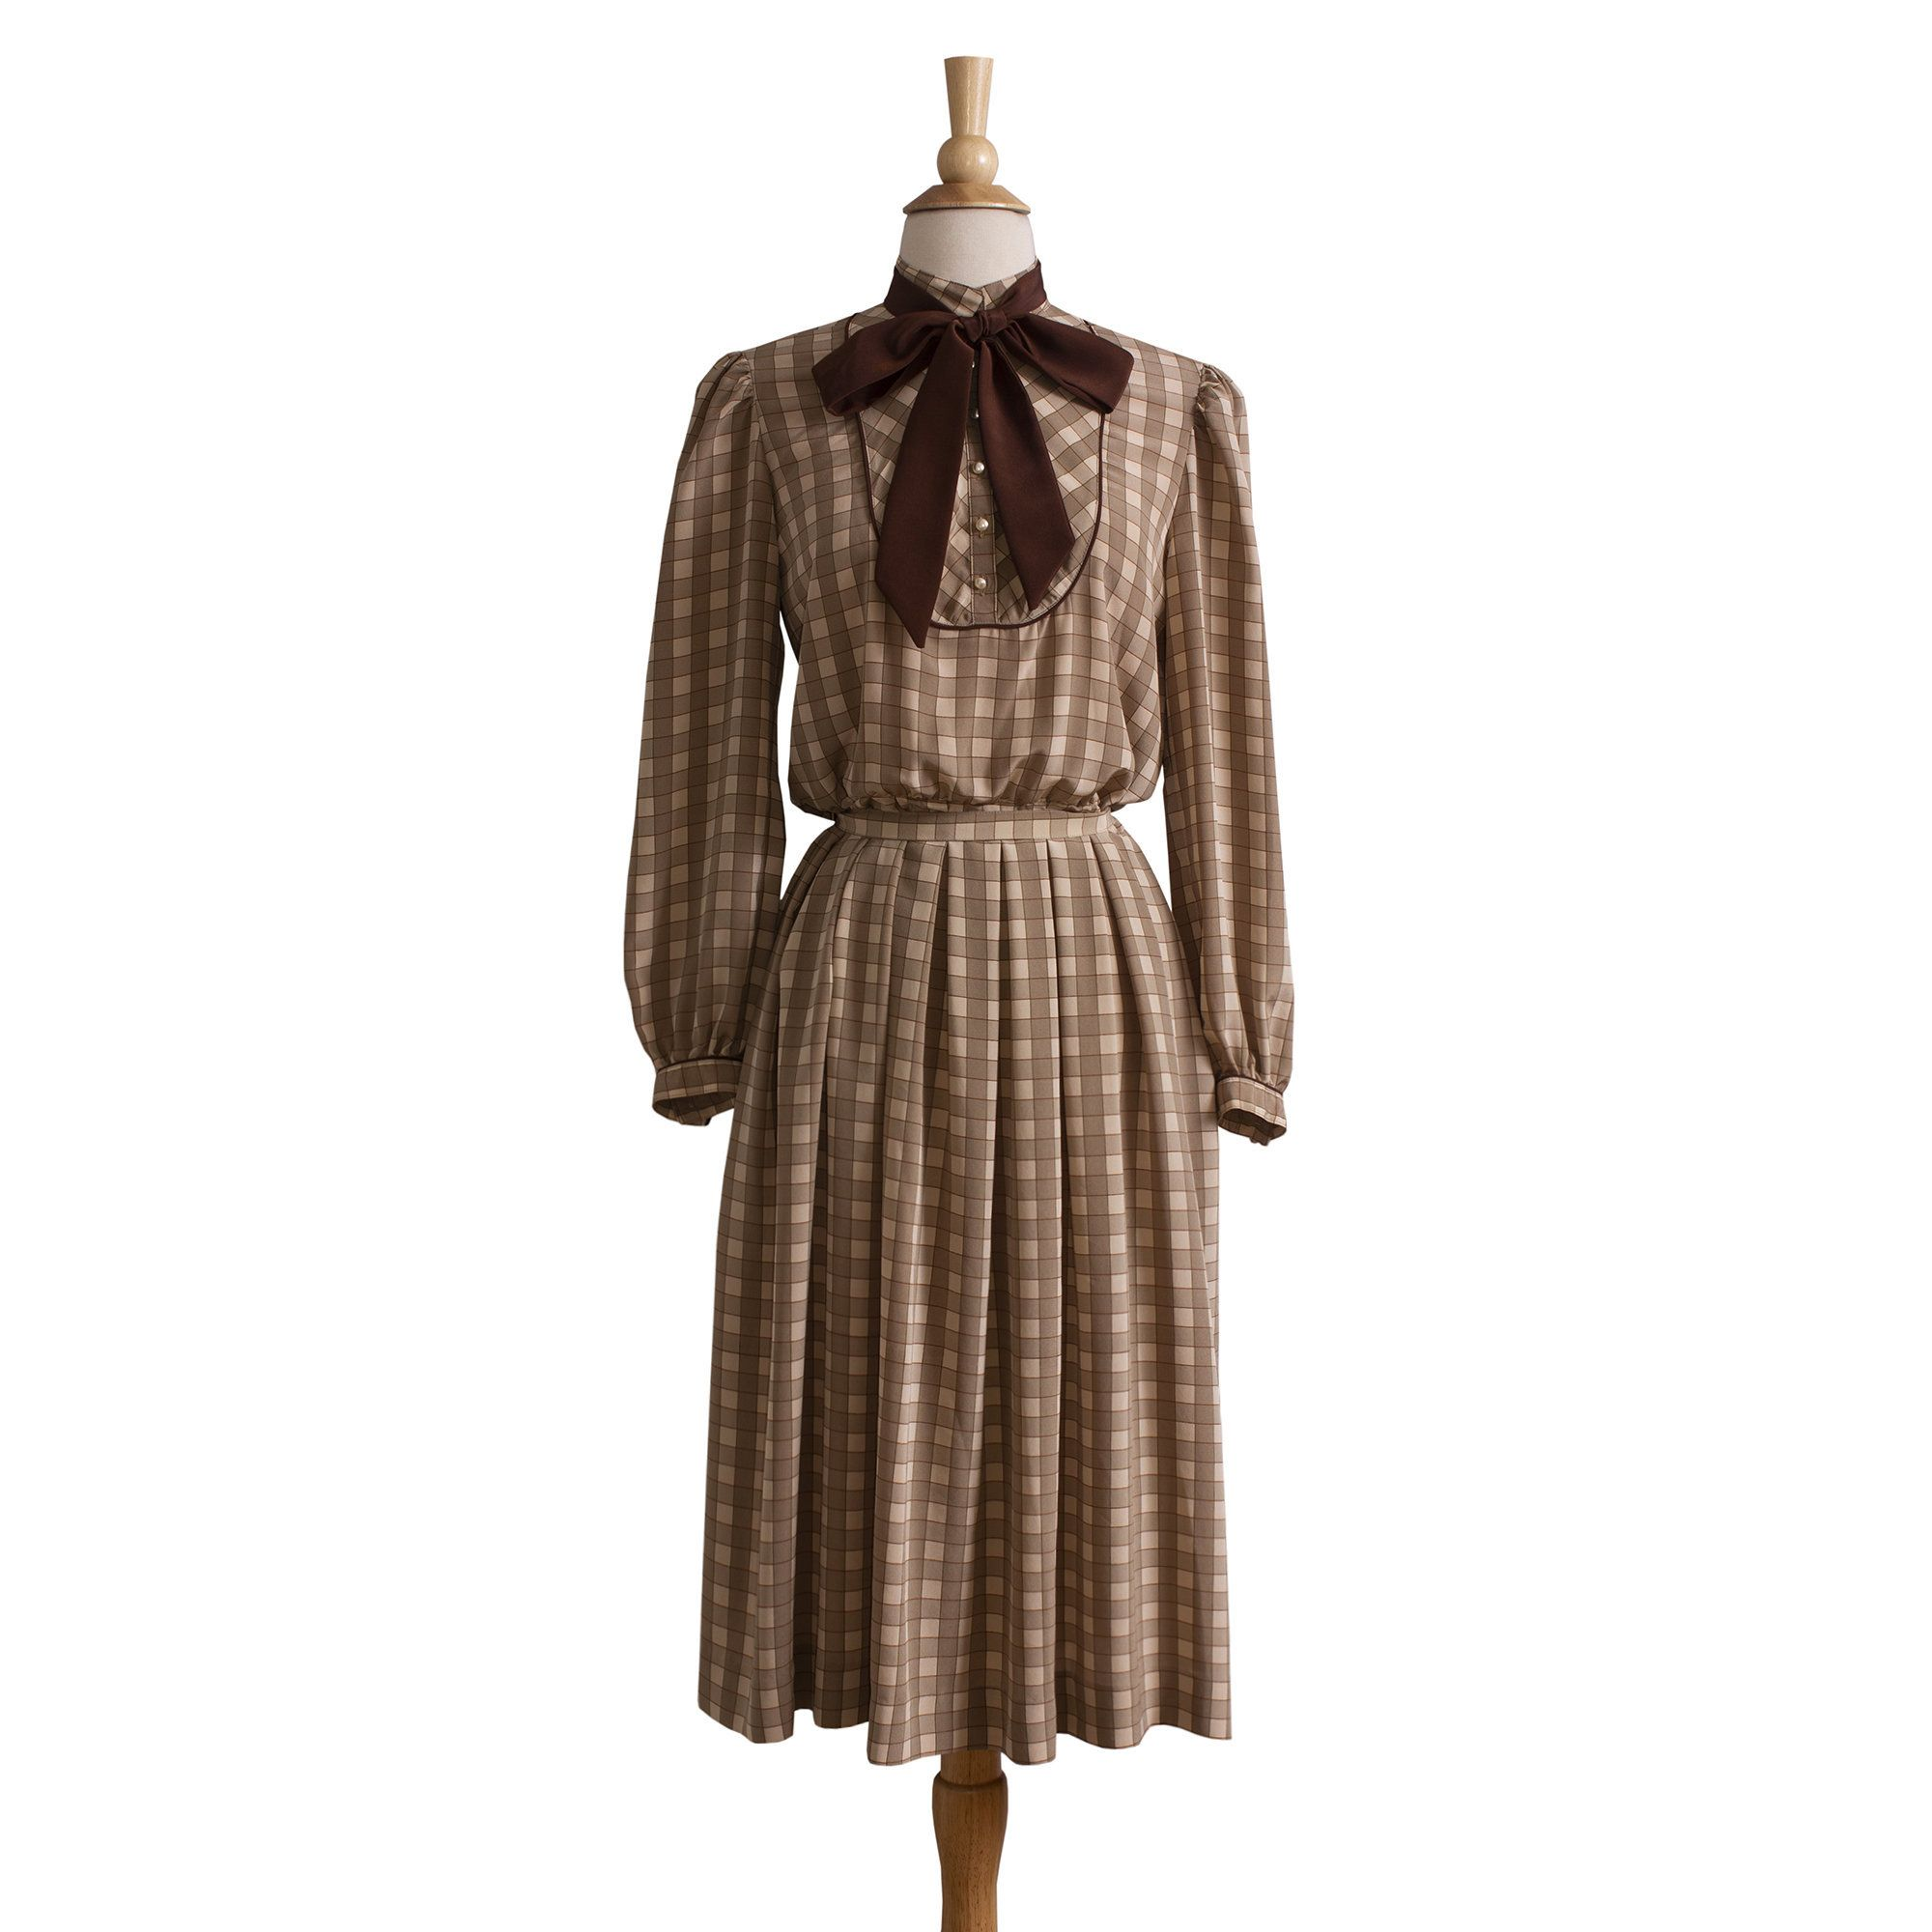 Vintage 1980s New Name In Town Black Blue Floral Top Skirt Set Women/'s Medium